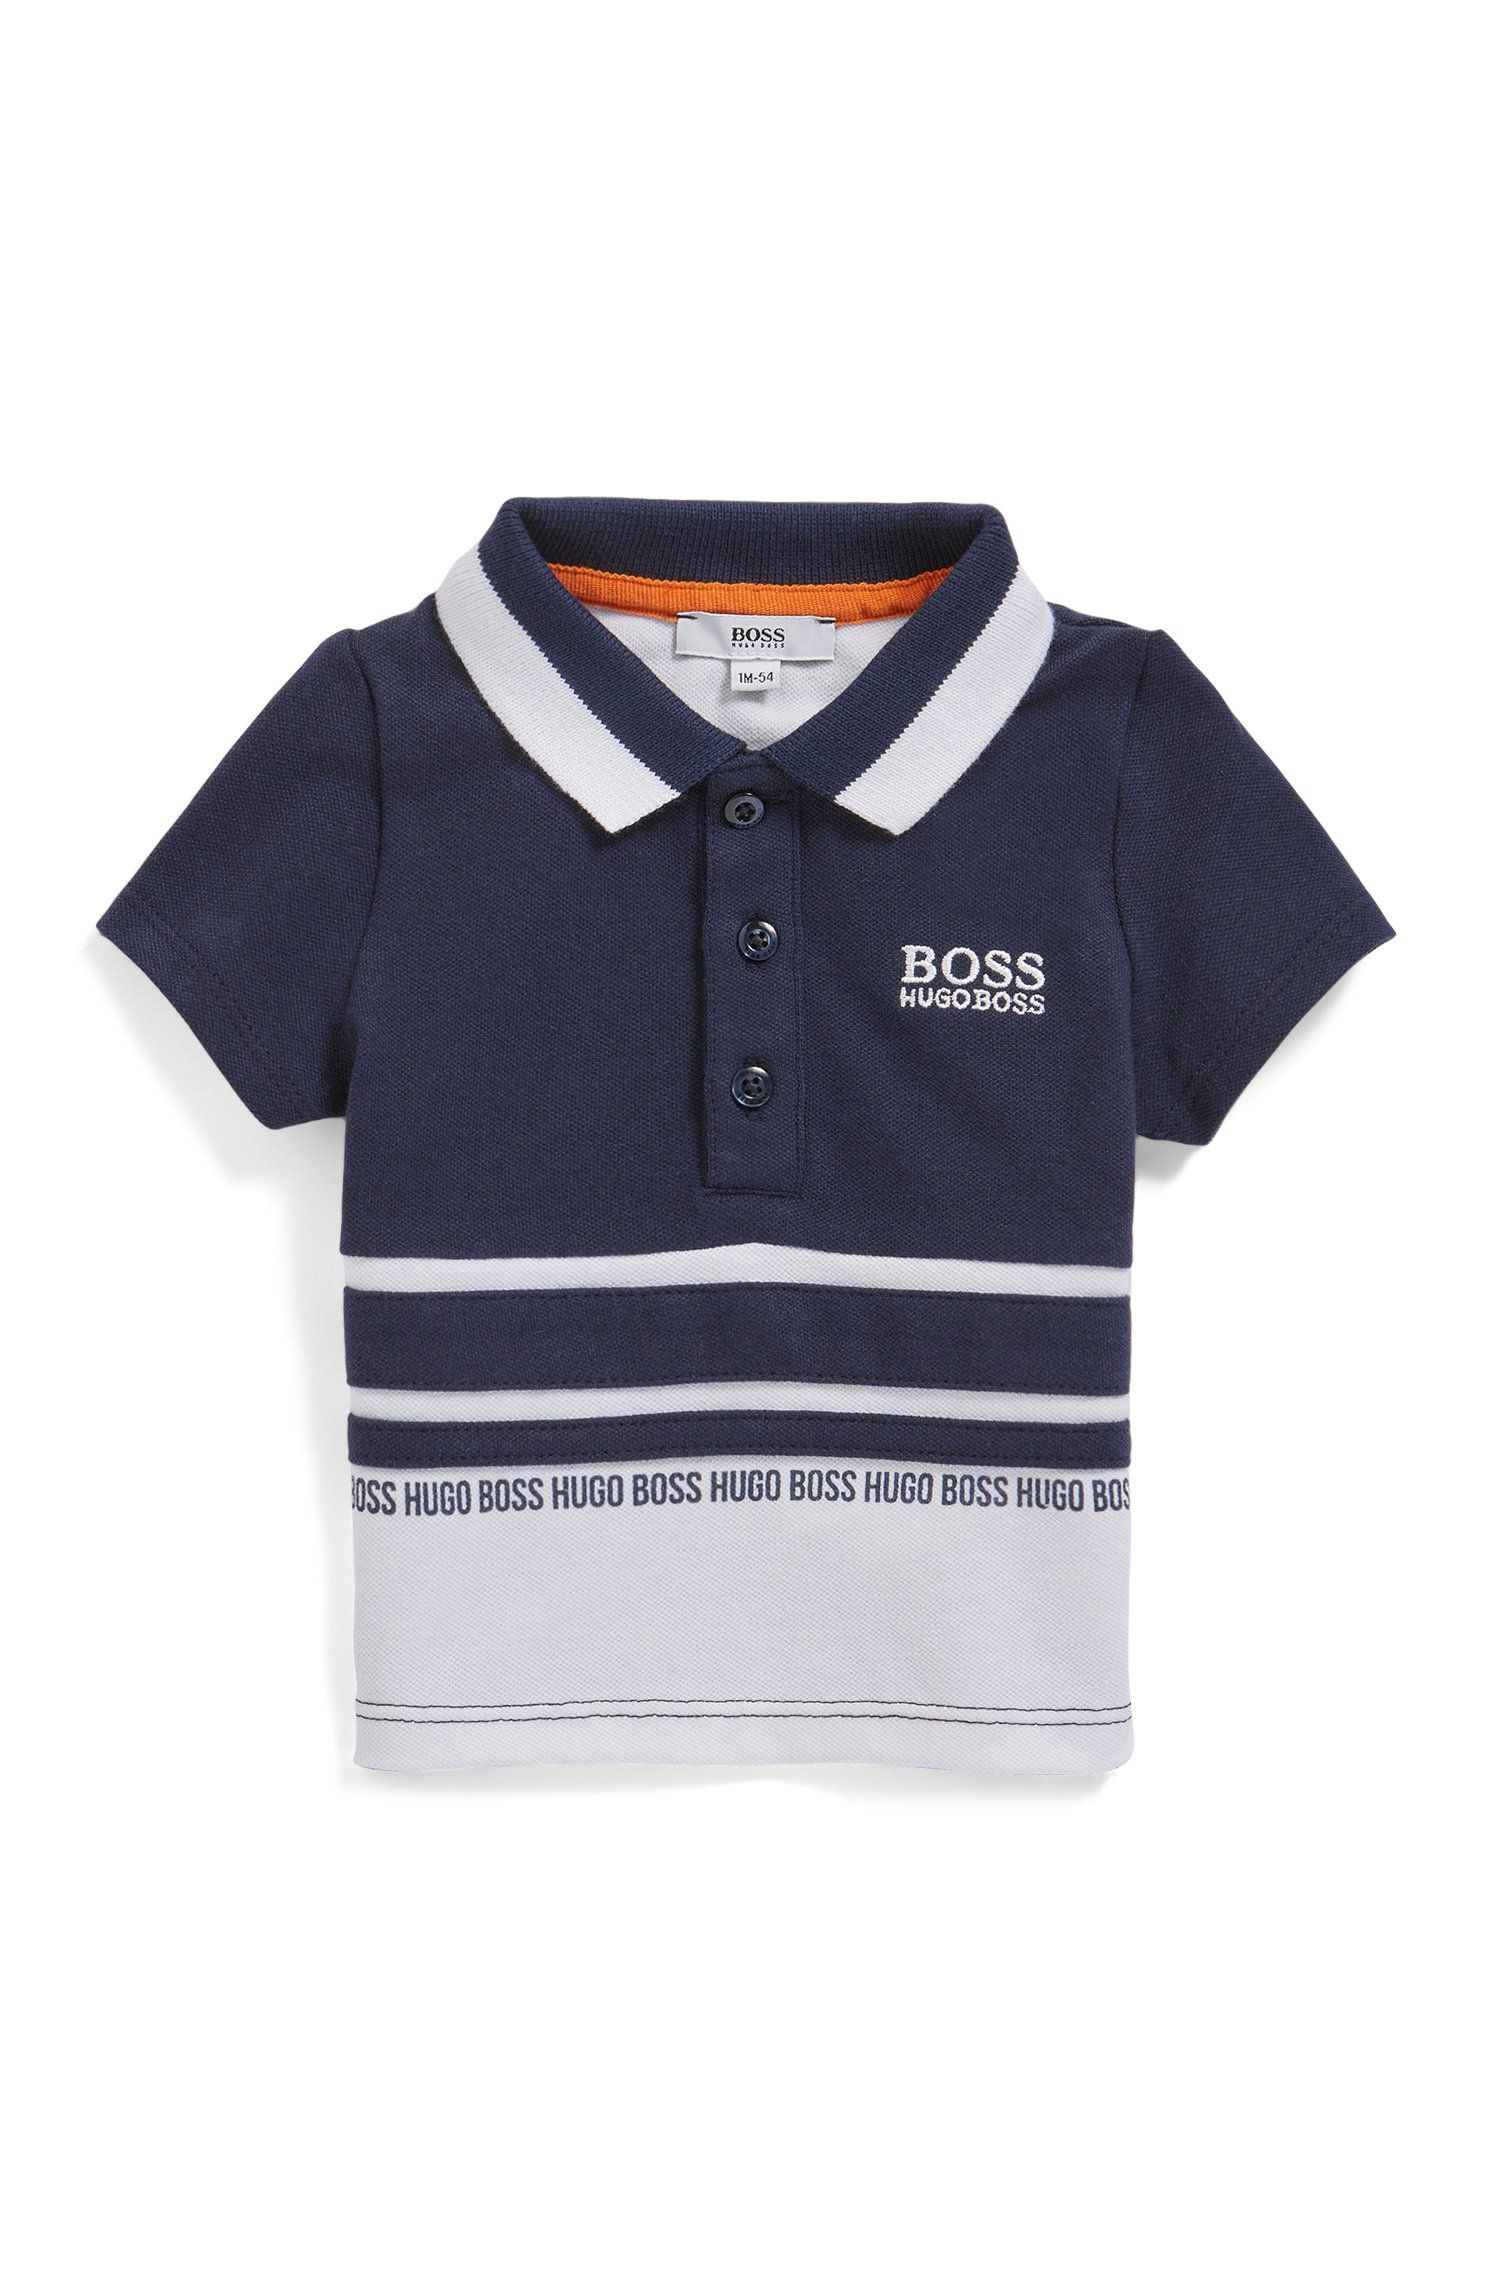 NWT Mayoral Boys/' Long Sleeve Emblem Polo